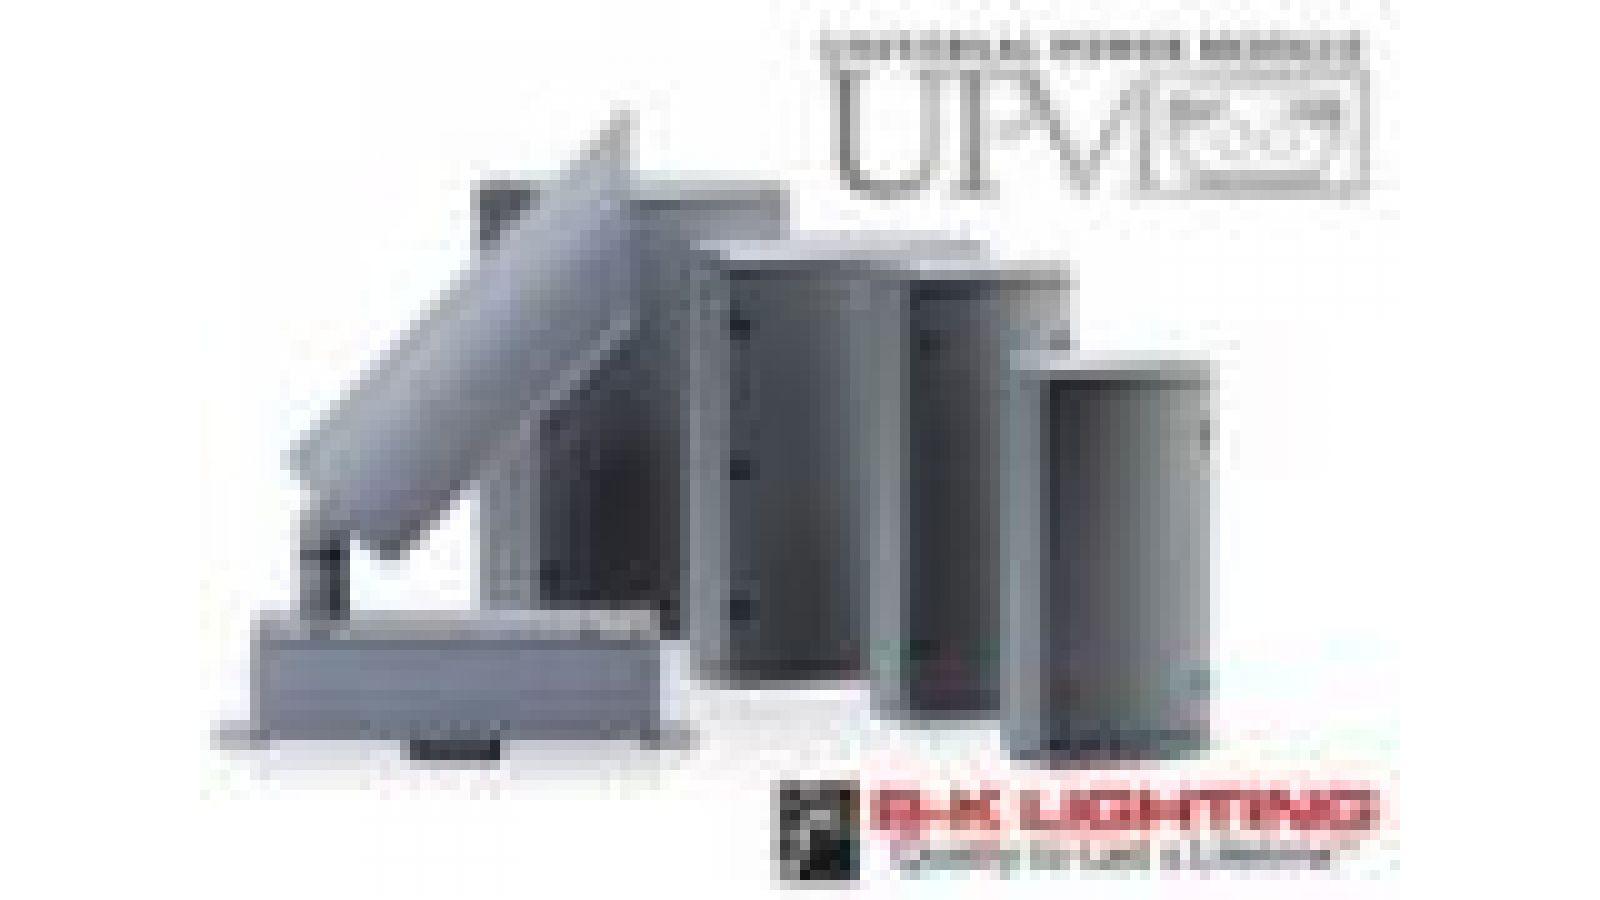 Universal Power Modular Series